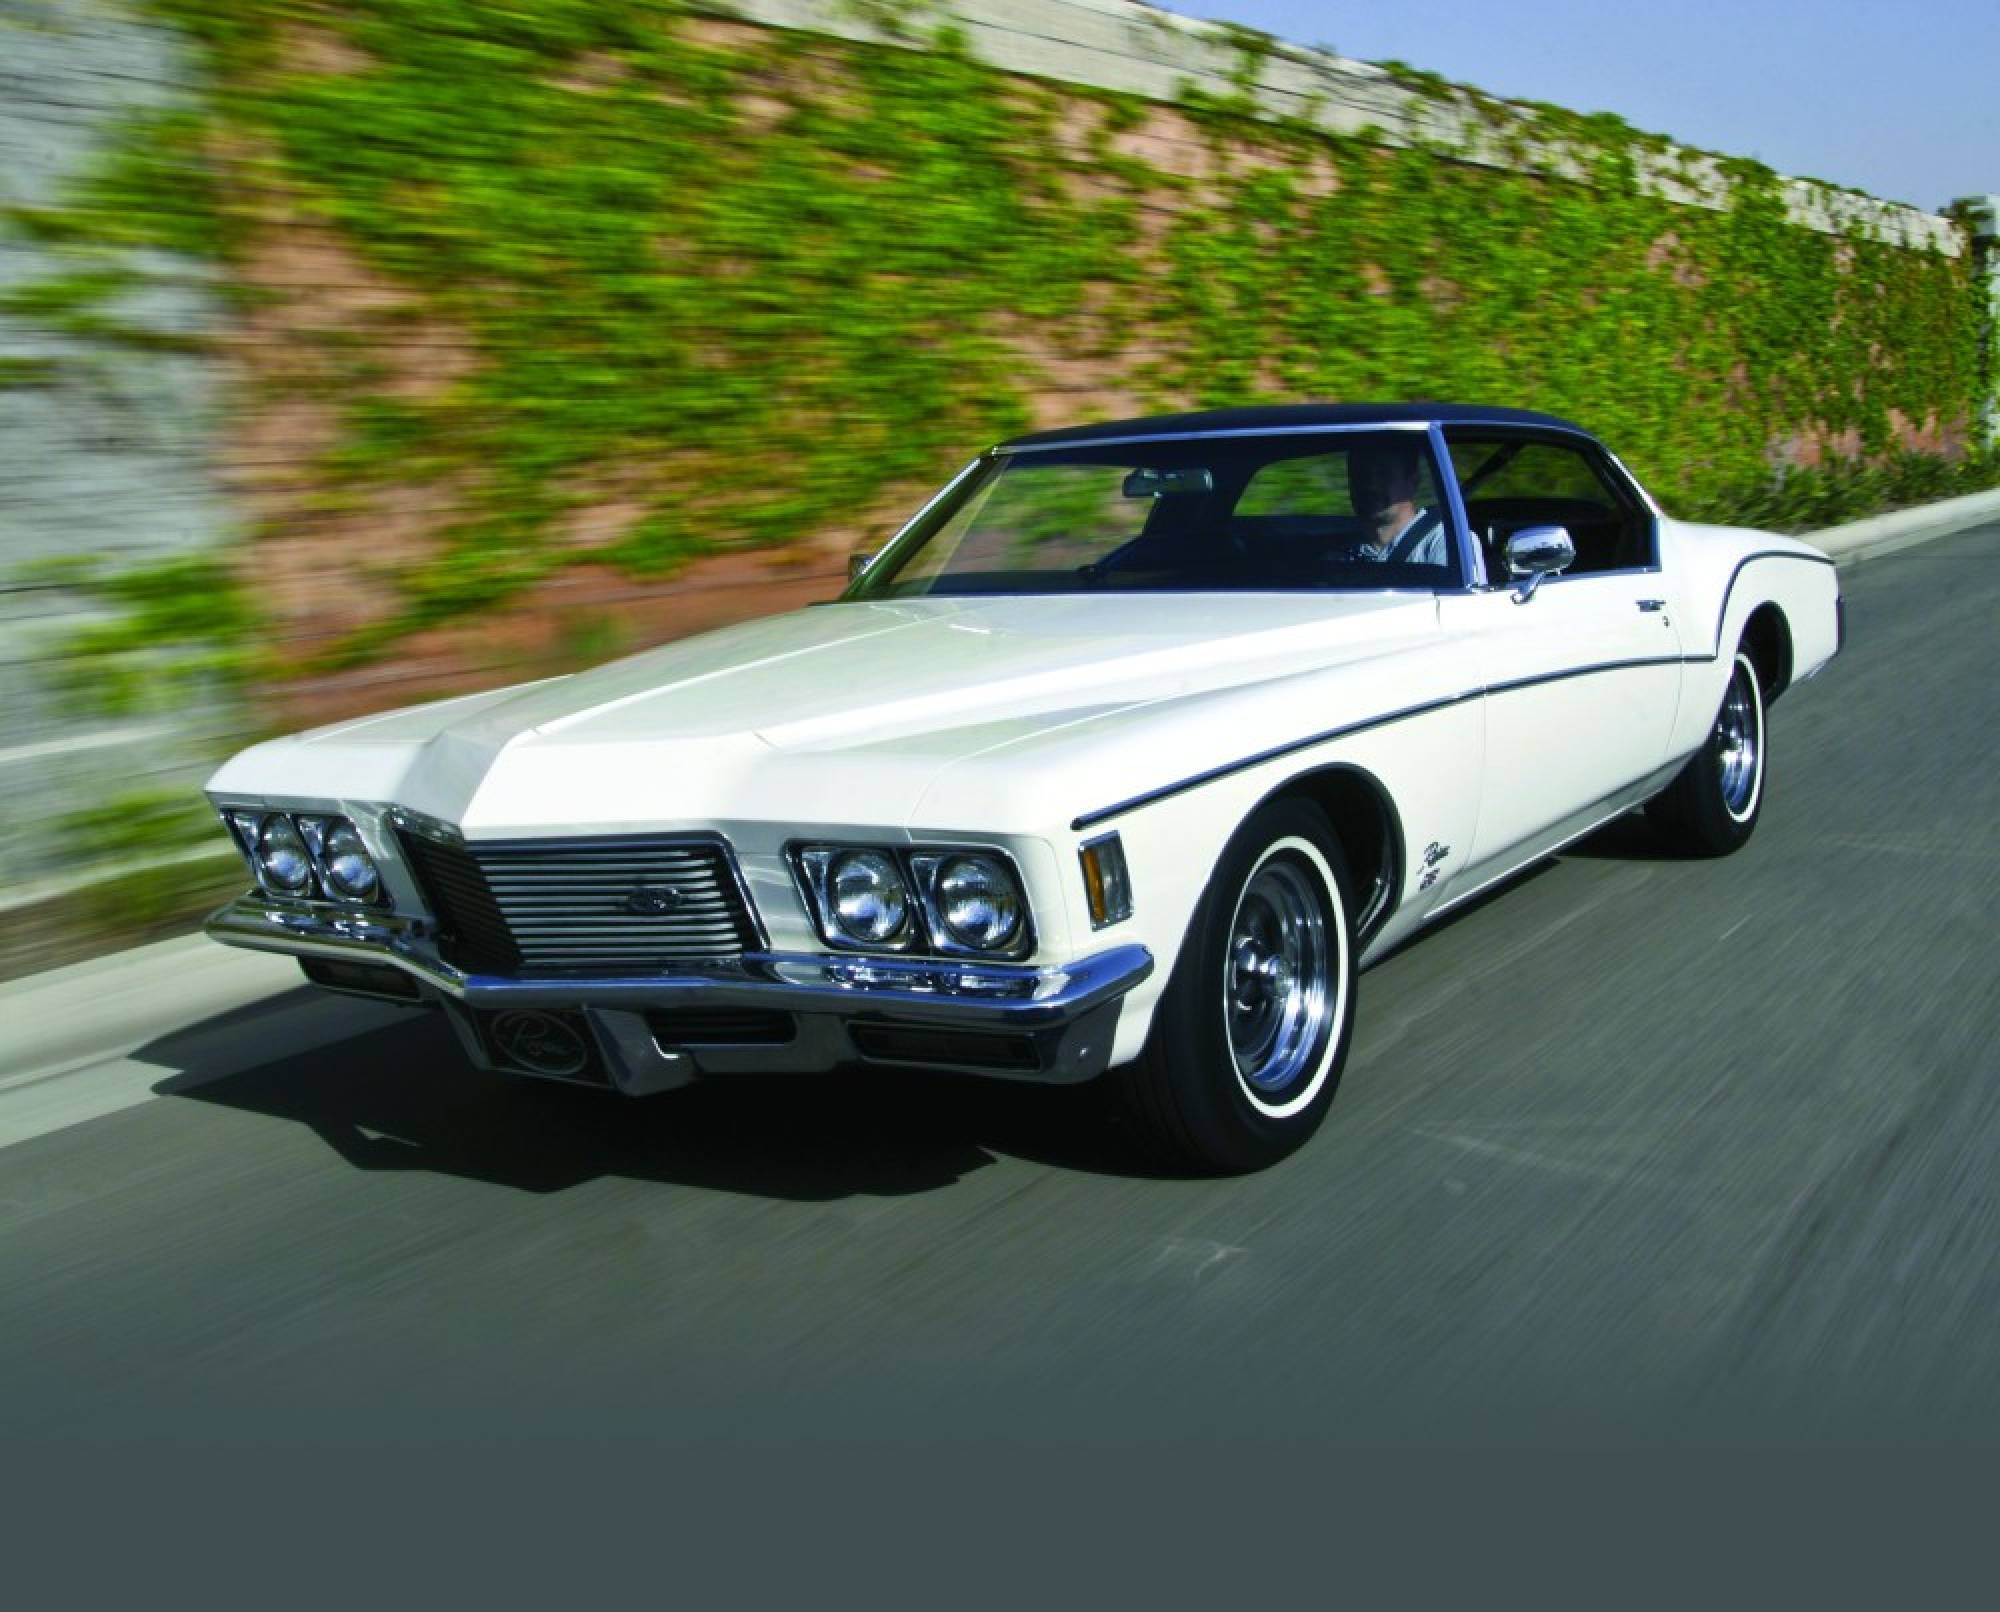 Buick Riviera III 1971 - 1973 Coupe #3